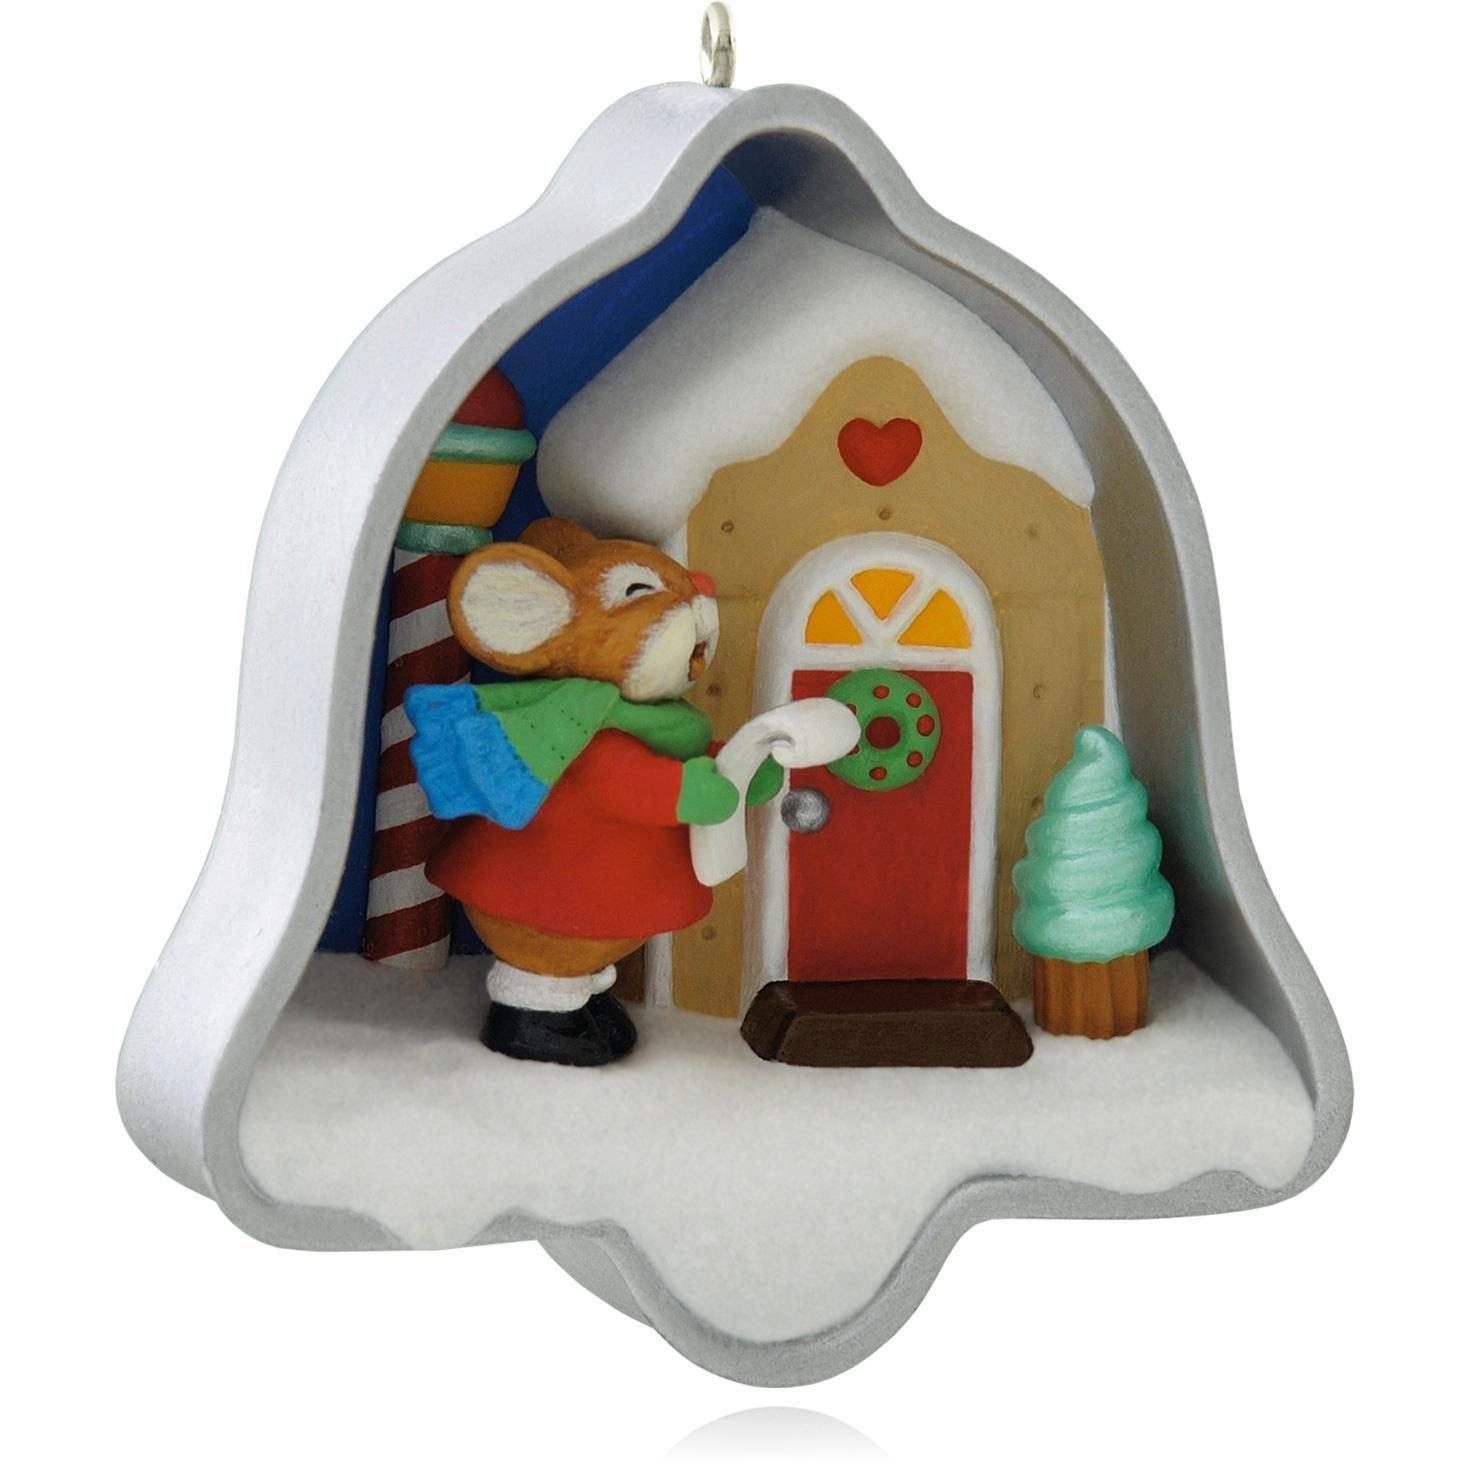 Hallmark 1 X Cookie Cutter Christmas 3rd In Series - 2014 Keepsake Ornament